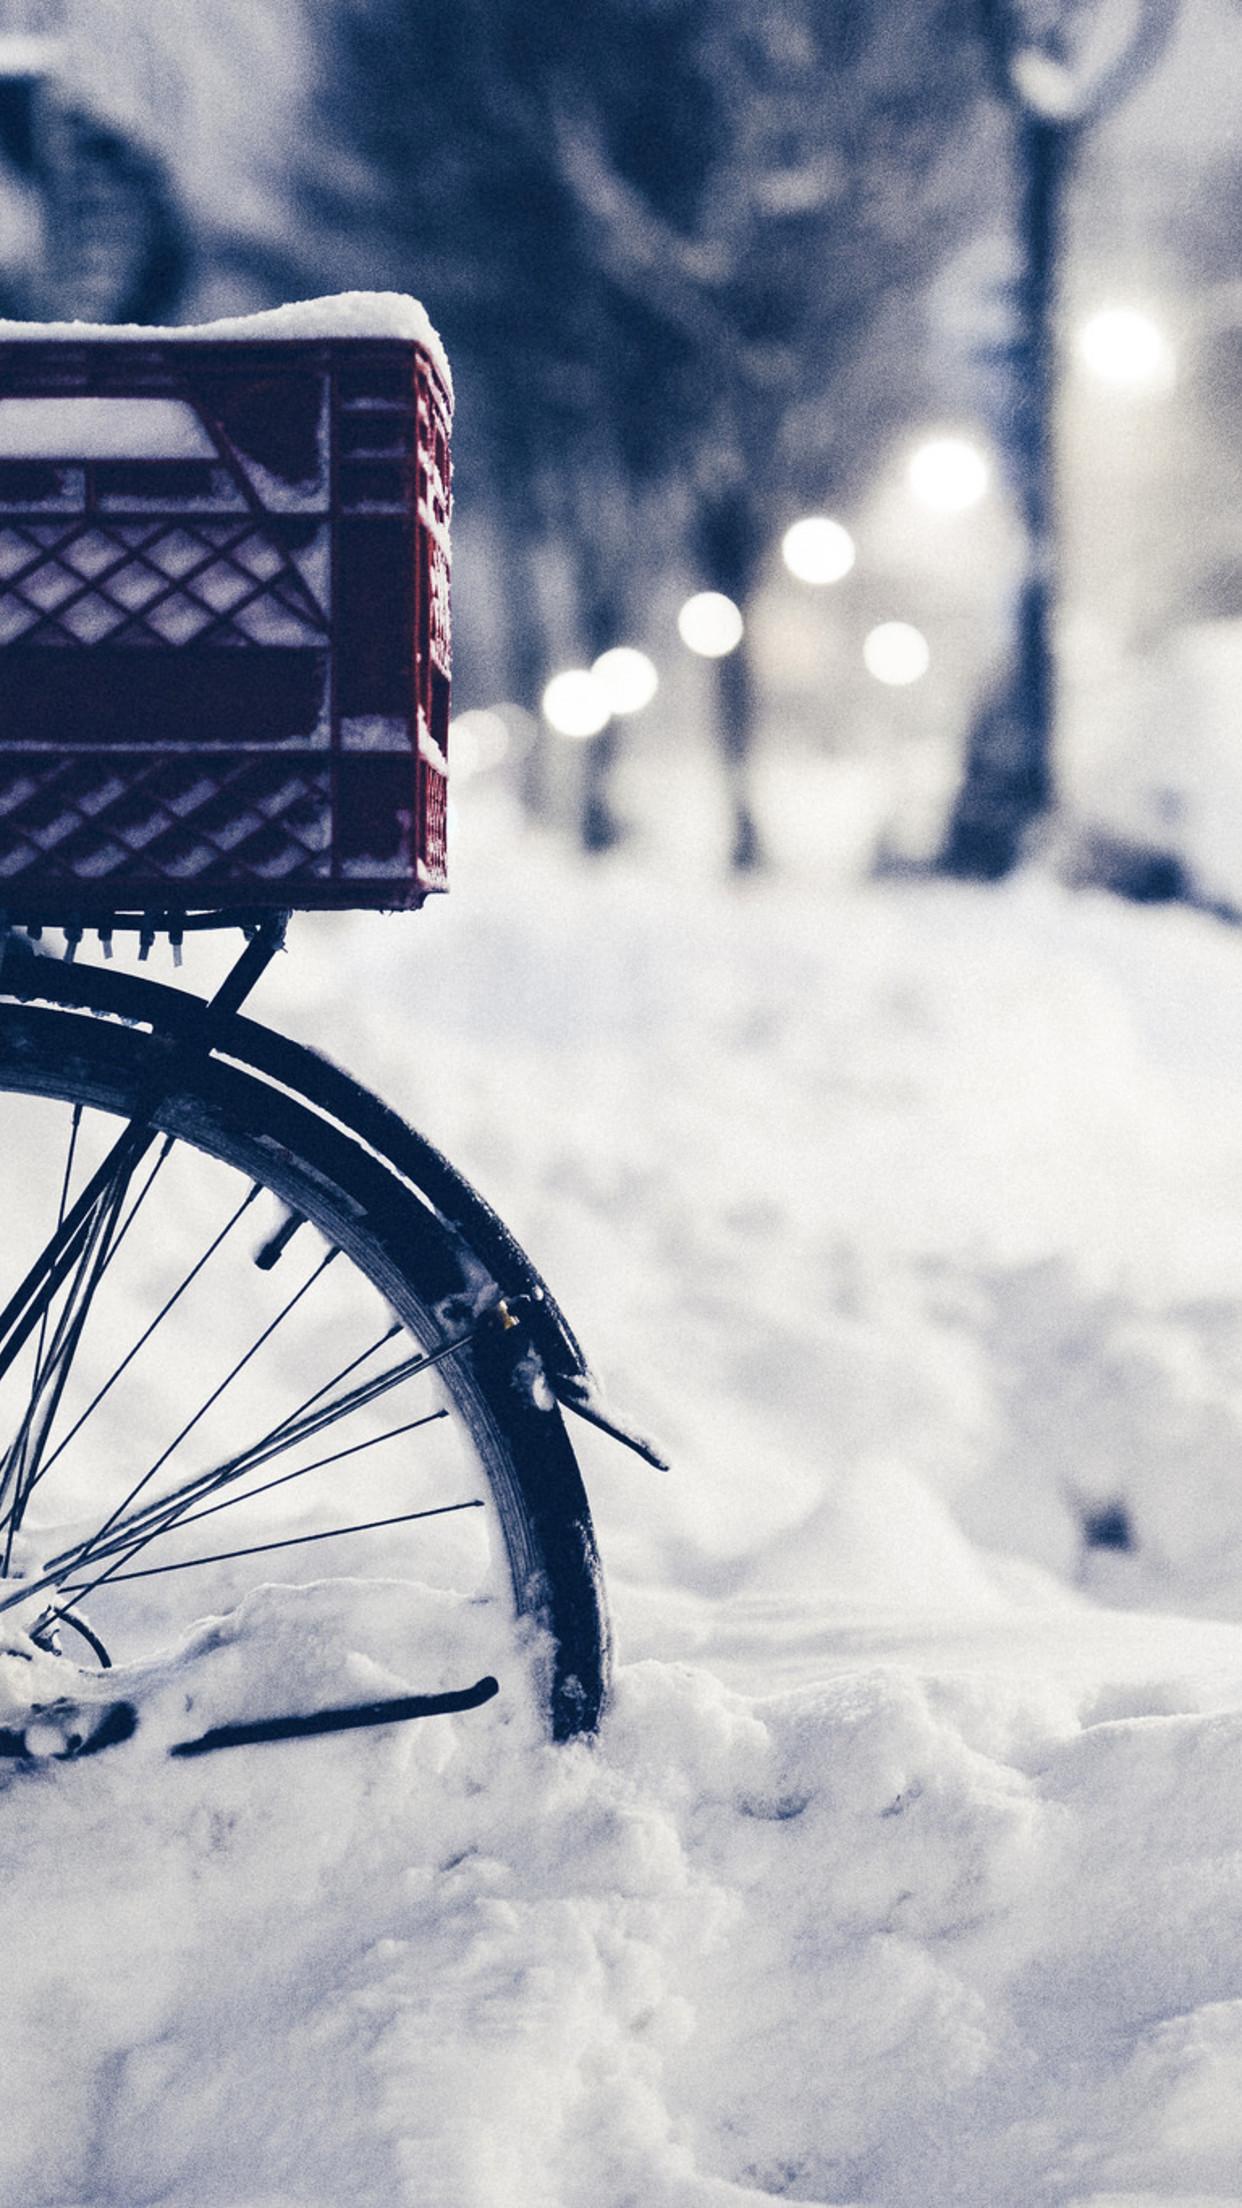 snow bike 3Wallpapers iPhone Parallax Les 3Wallpapers iPhone du jour (18/02/2016)